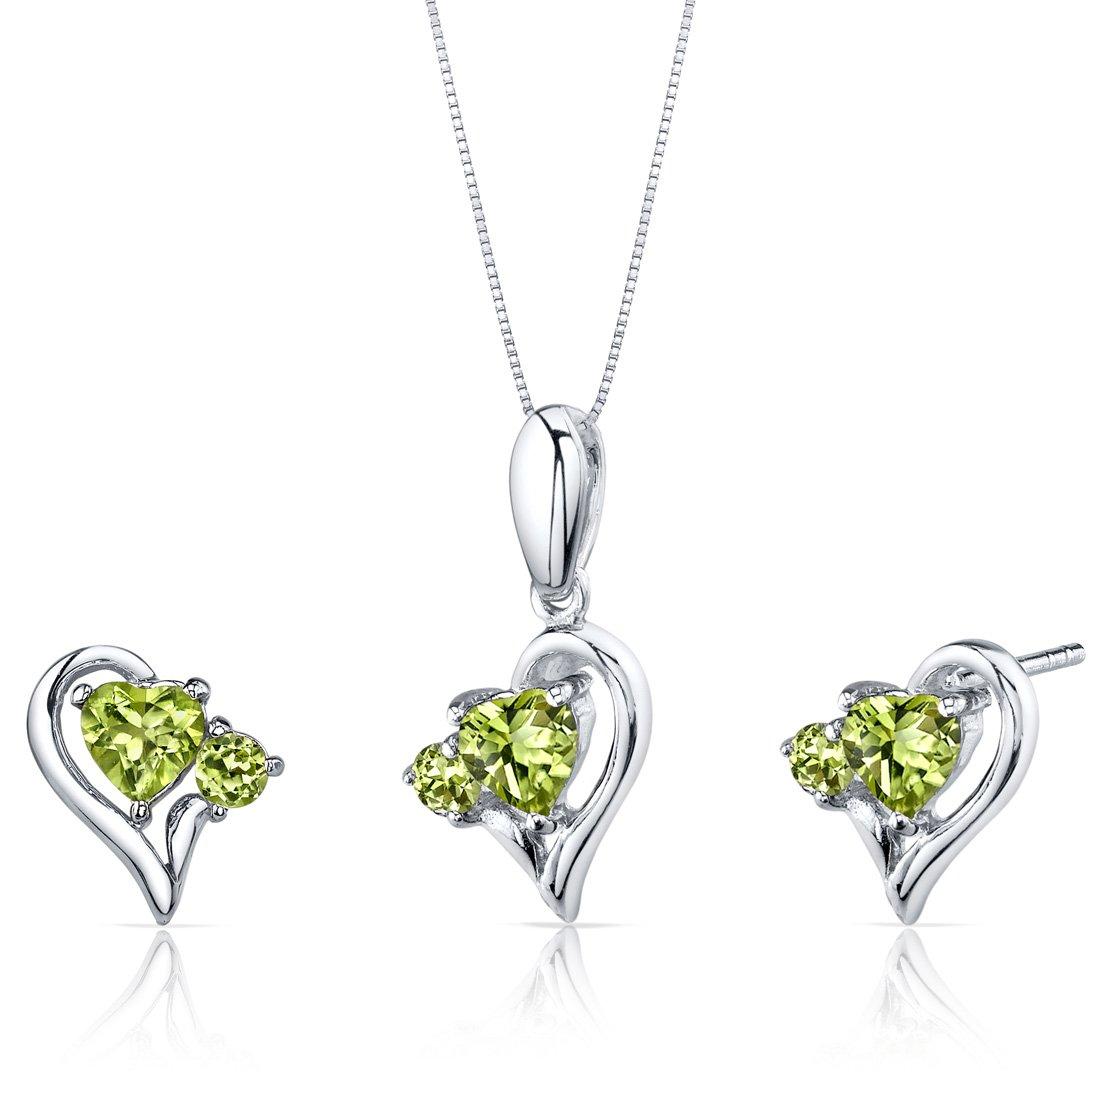 Peora Peridot Pendant Earrings Necklace Sterling Silver Heart Shape 2.25 Carats